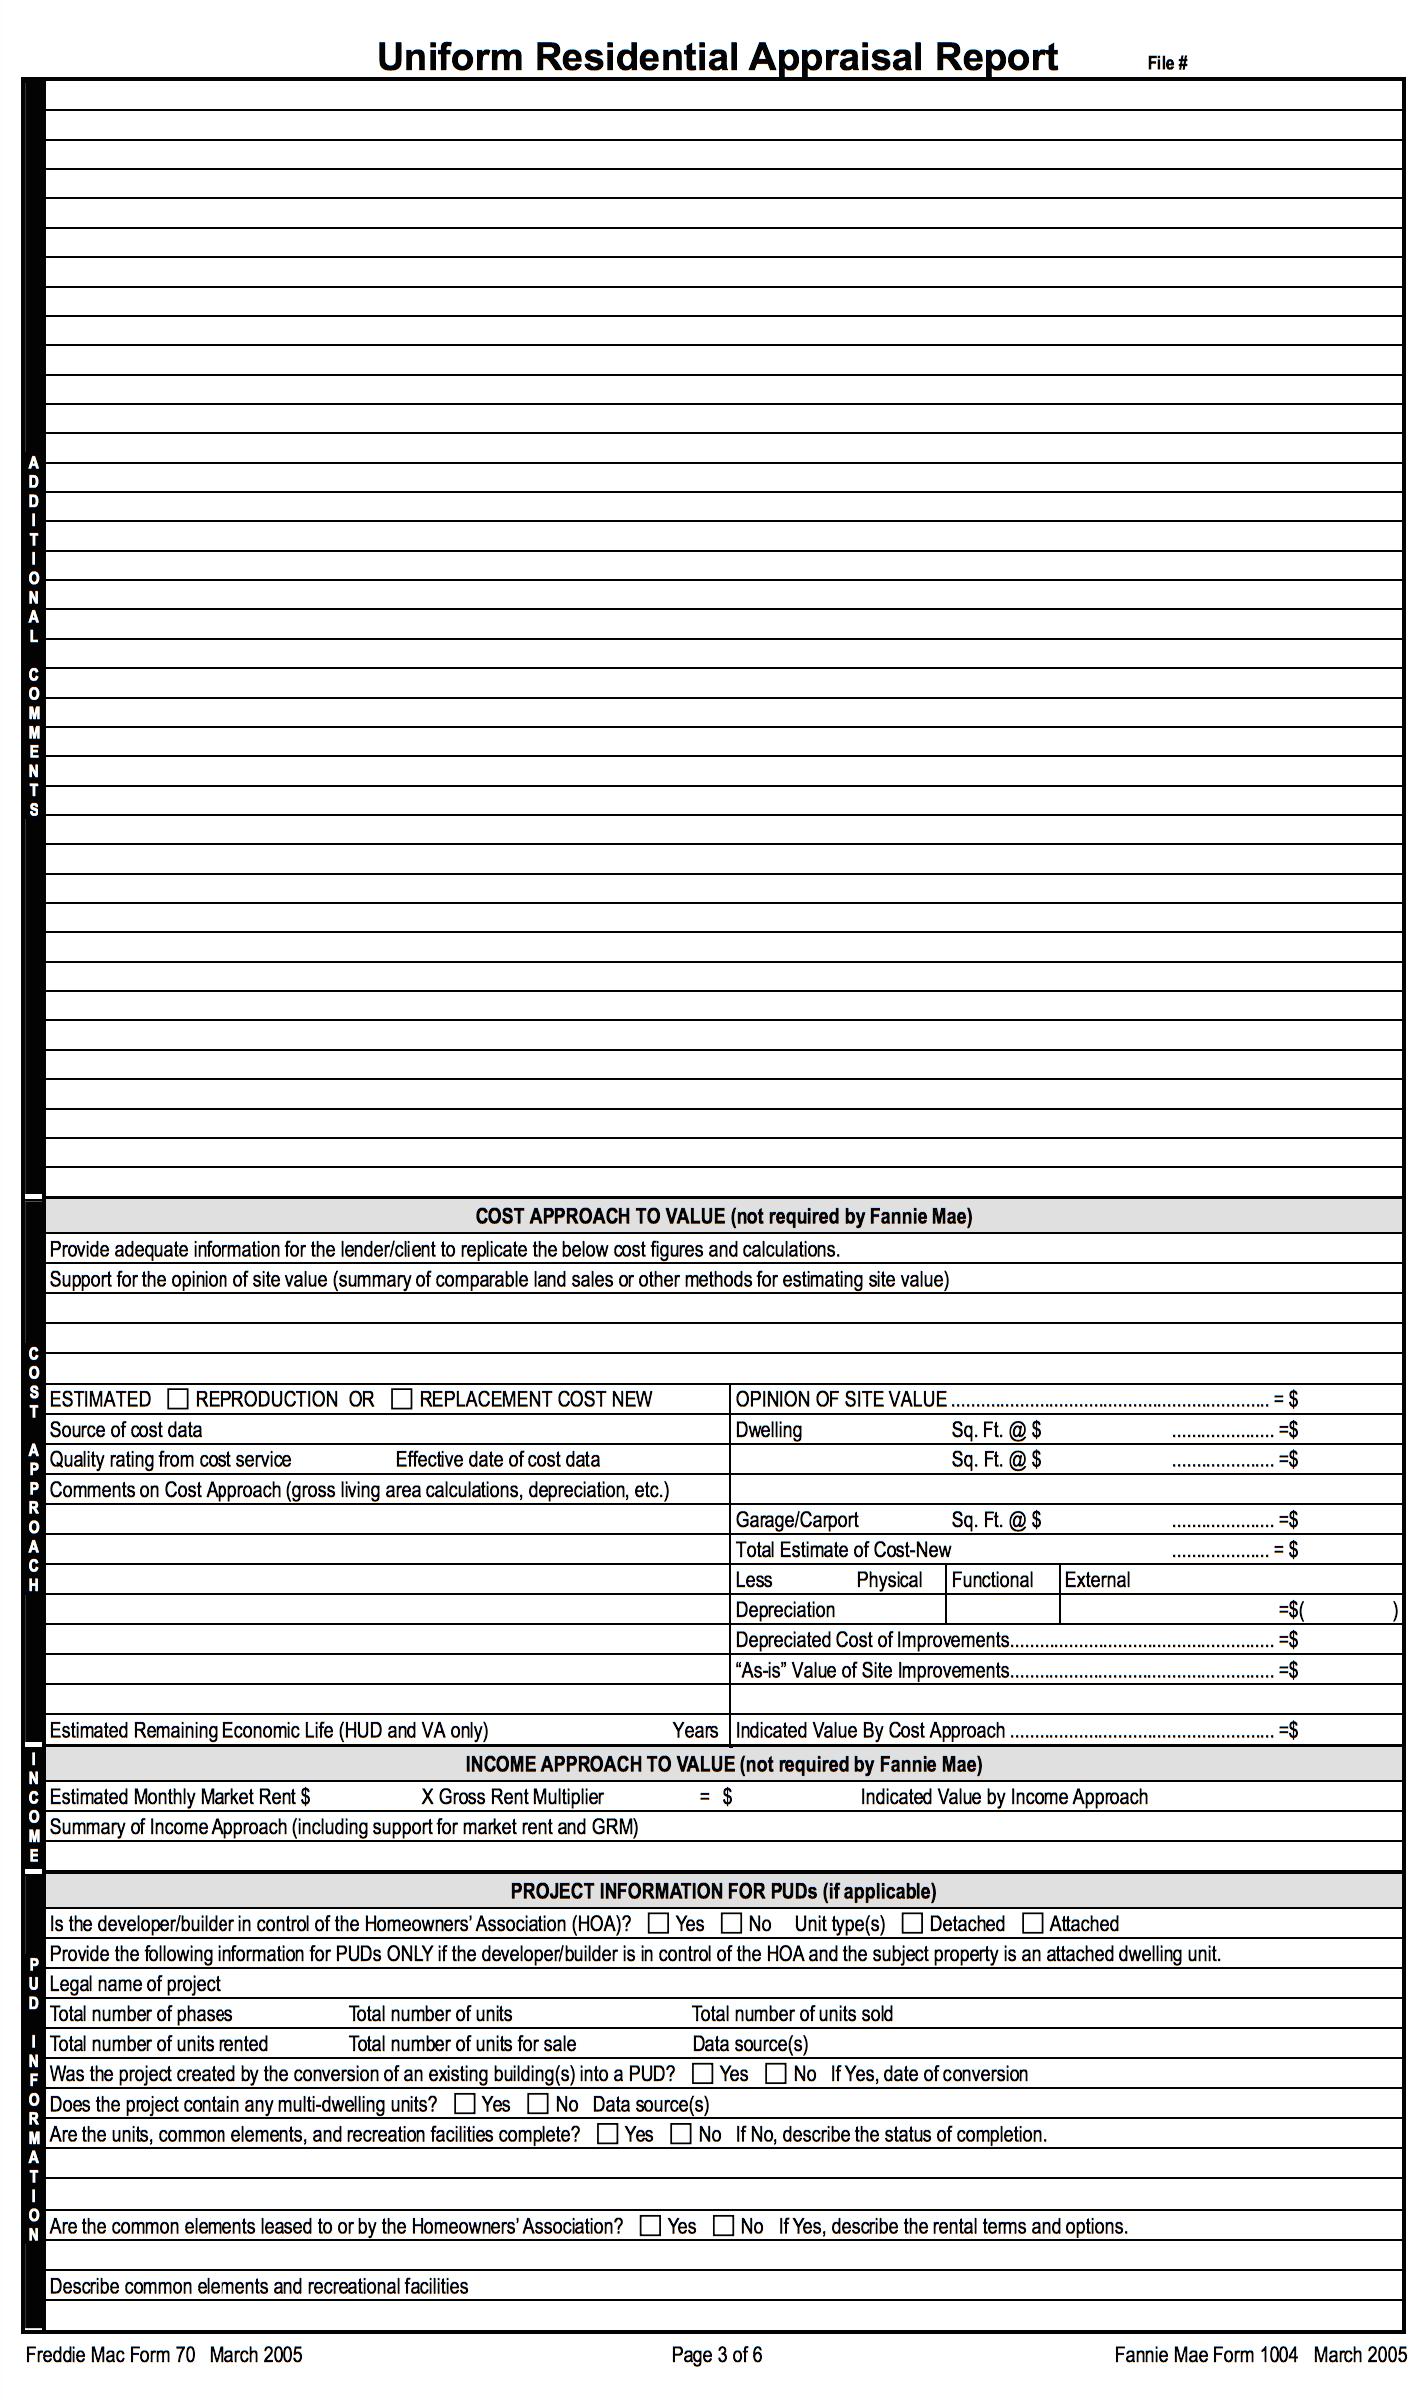 A home appraisal report.